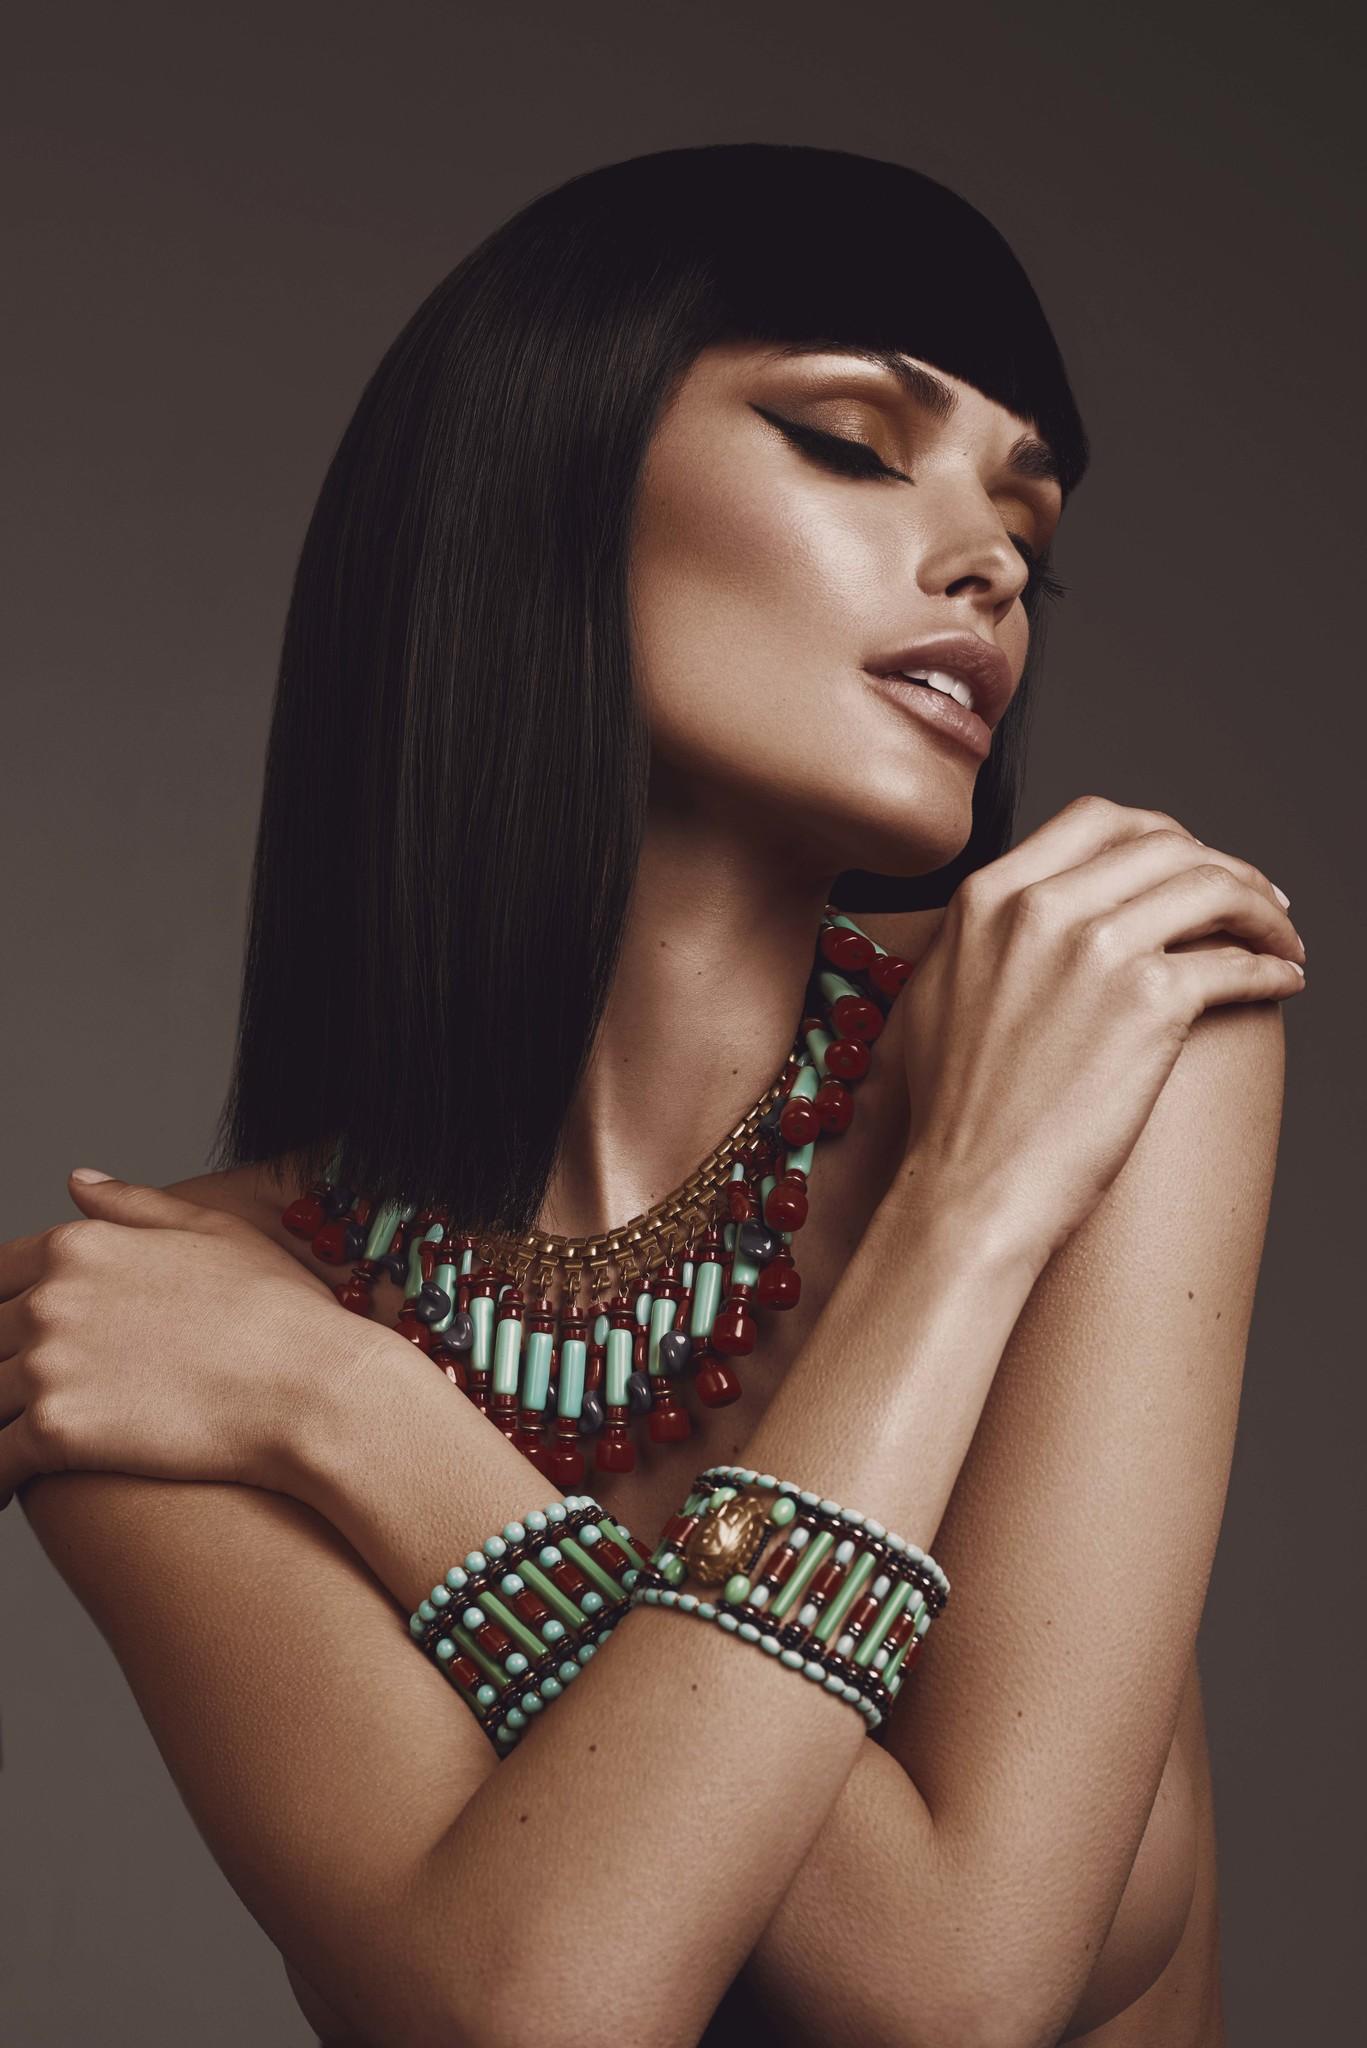 Ожерелье Miriam Haskell в египетском стиле 1970-е